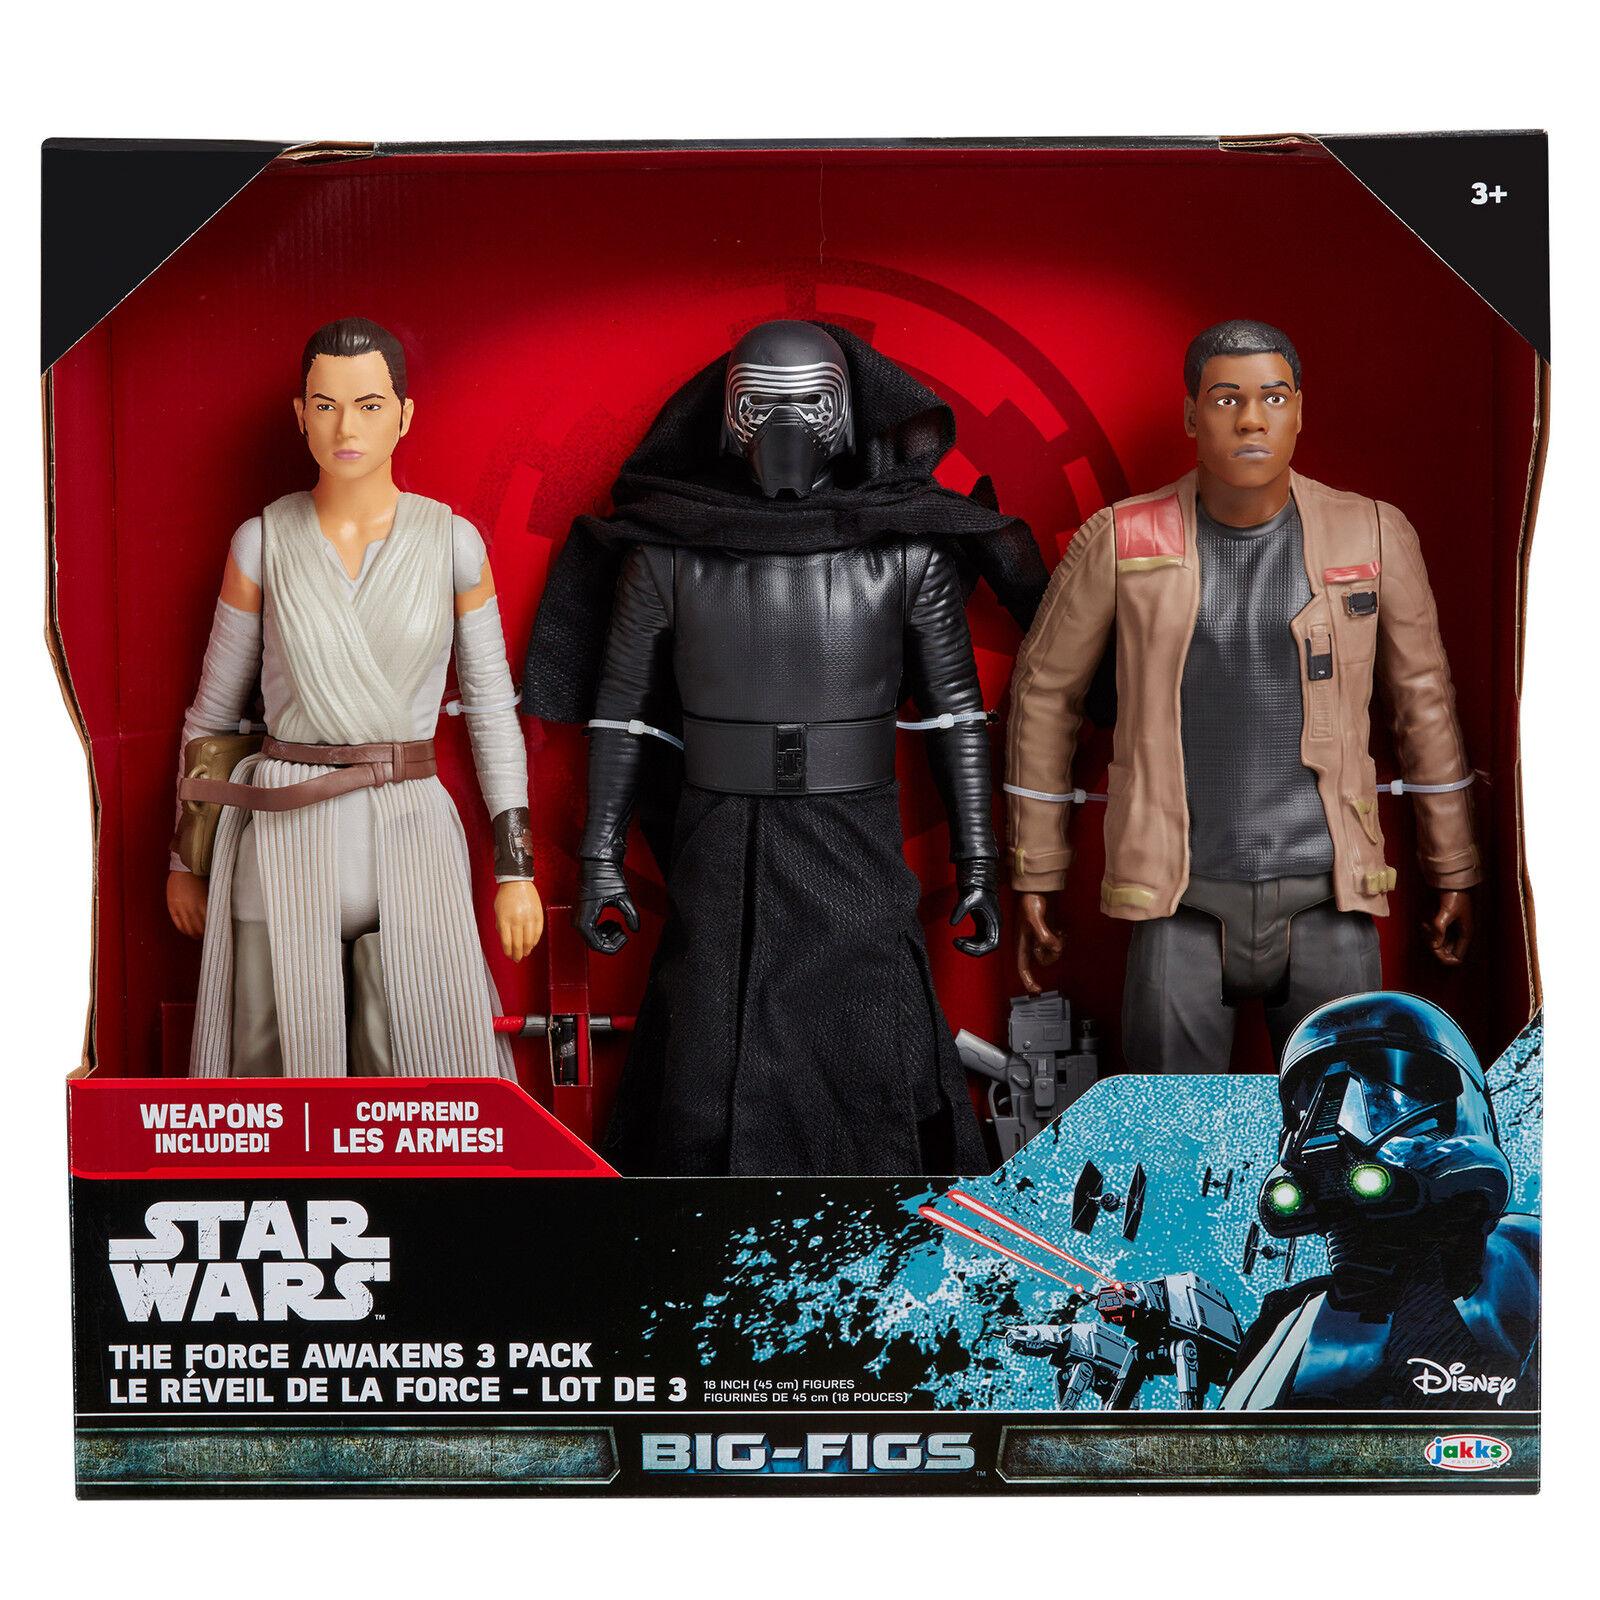 3 Star Wars The Force Awakens JAKKS BIG FIGS Action Figures Kylo Ren Finn Rey